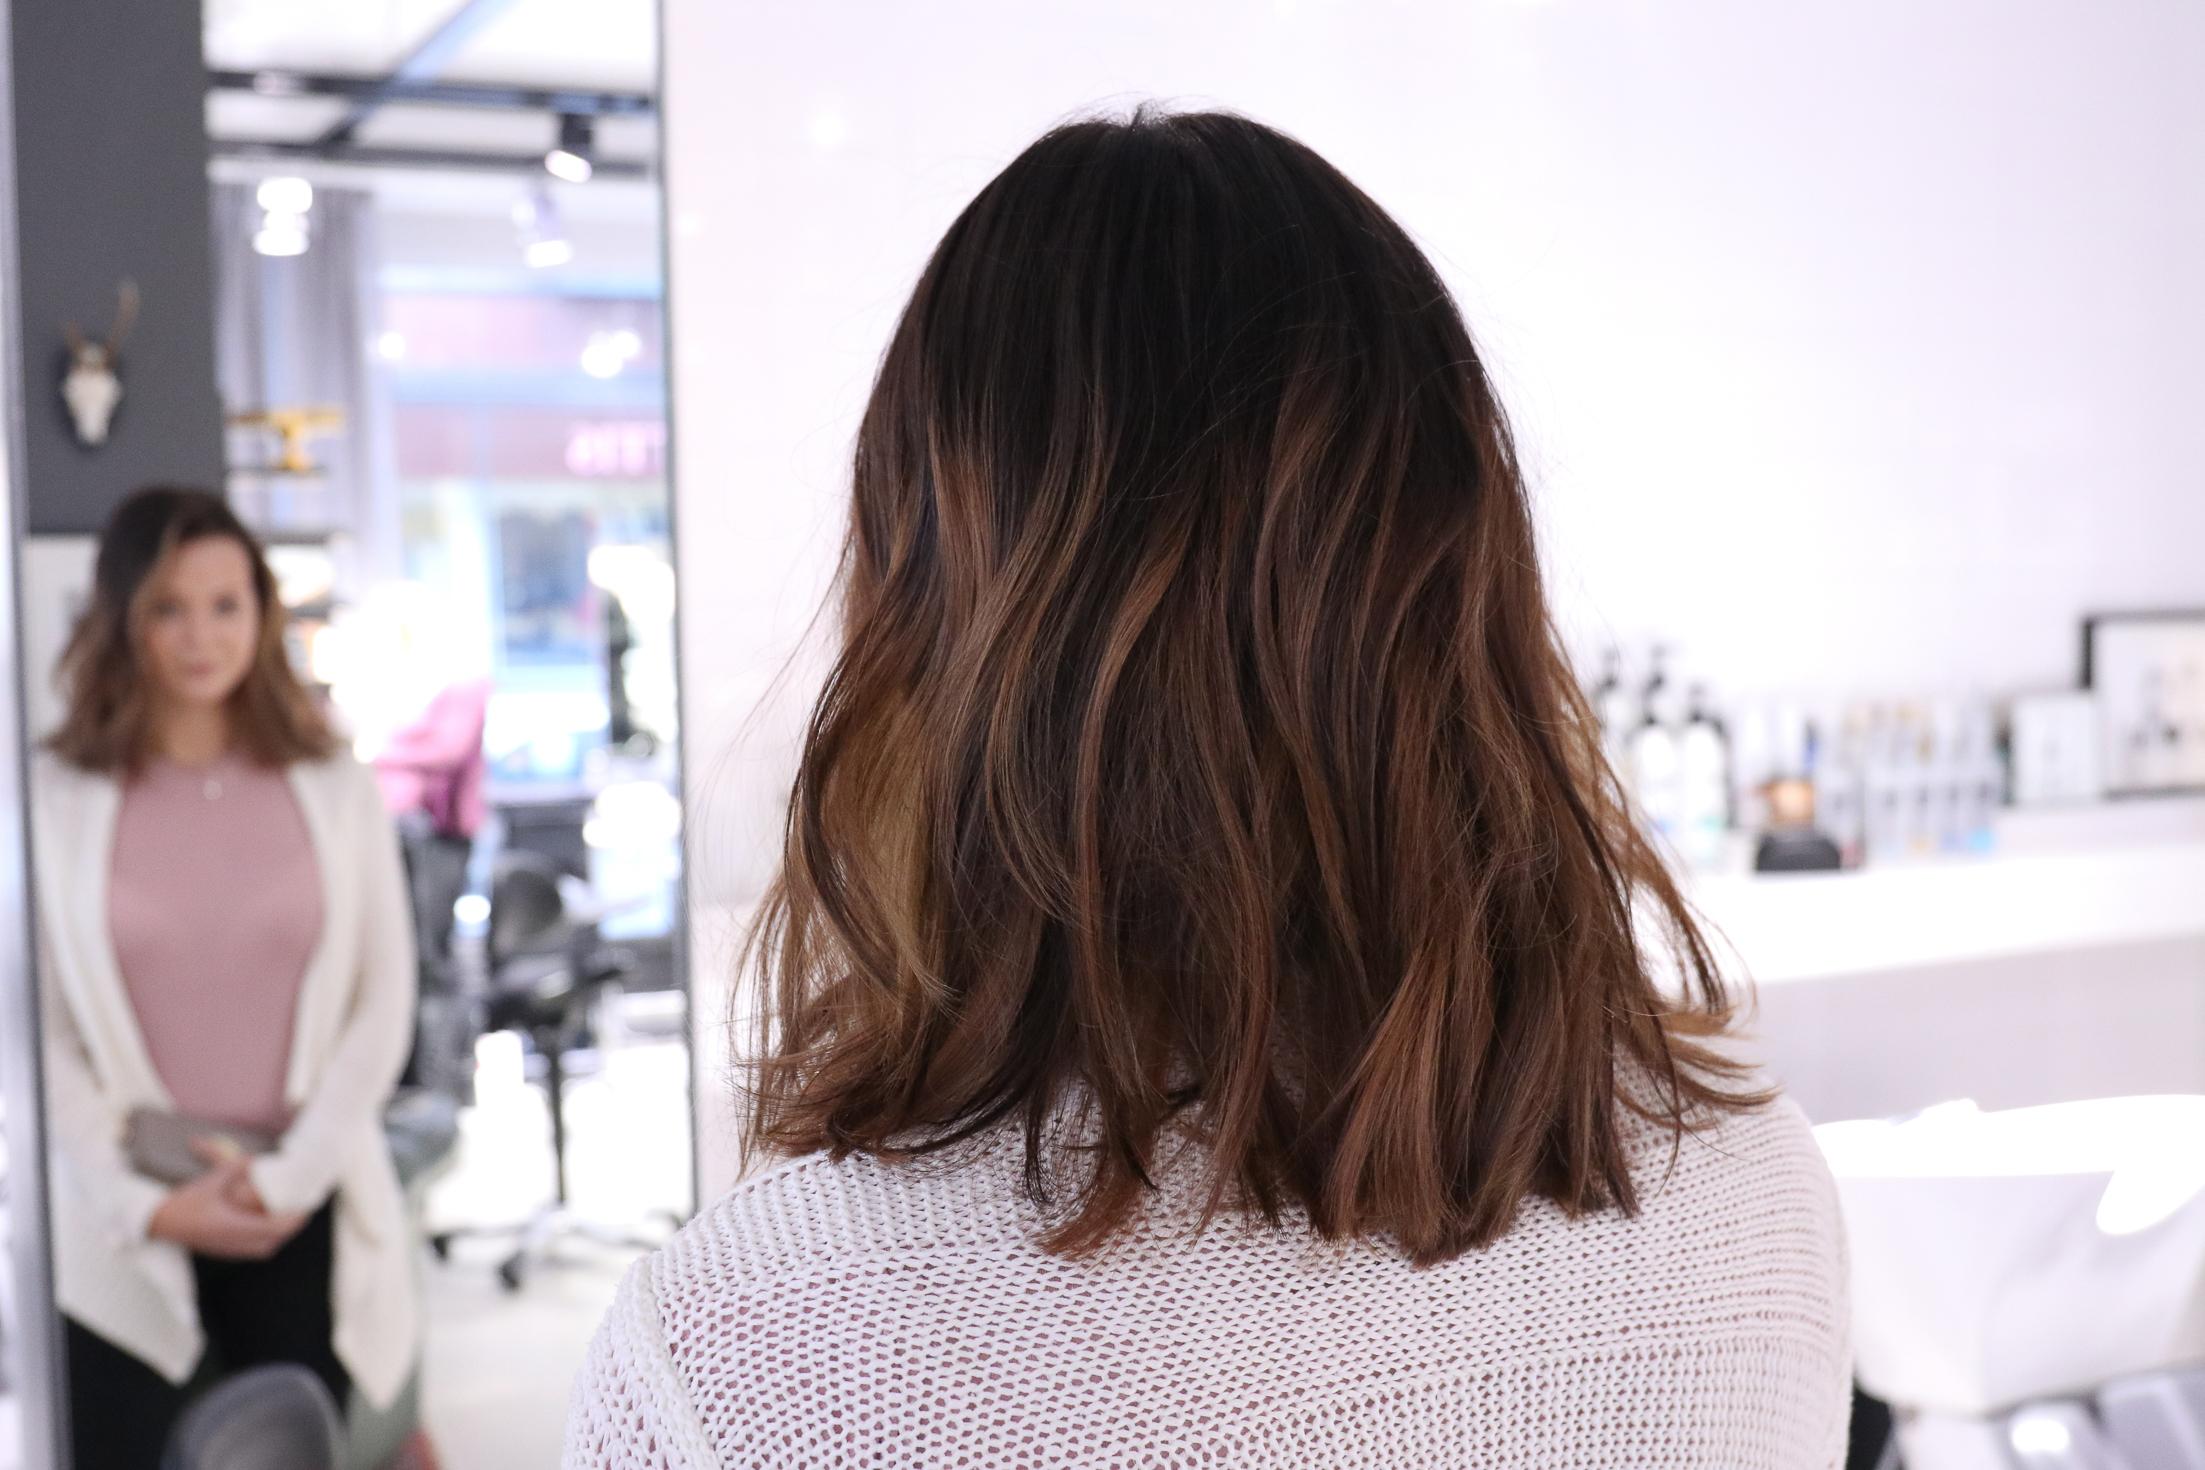 ljusbrunt hår med slingor